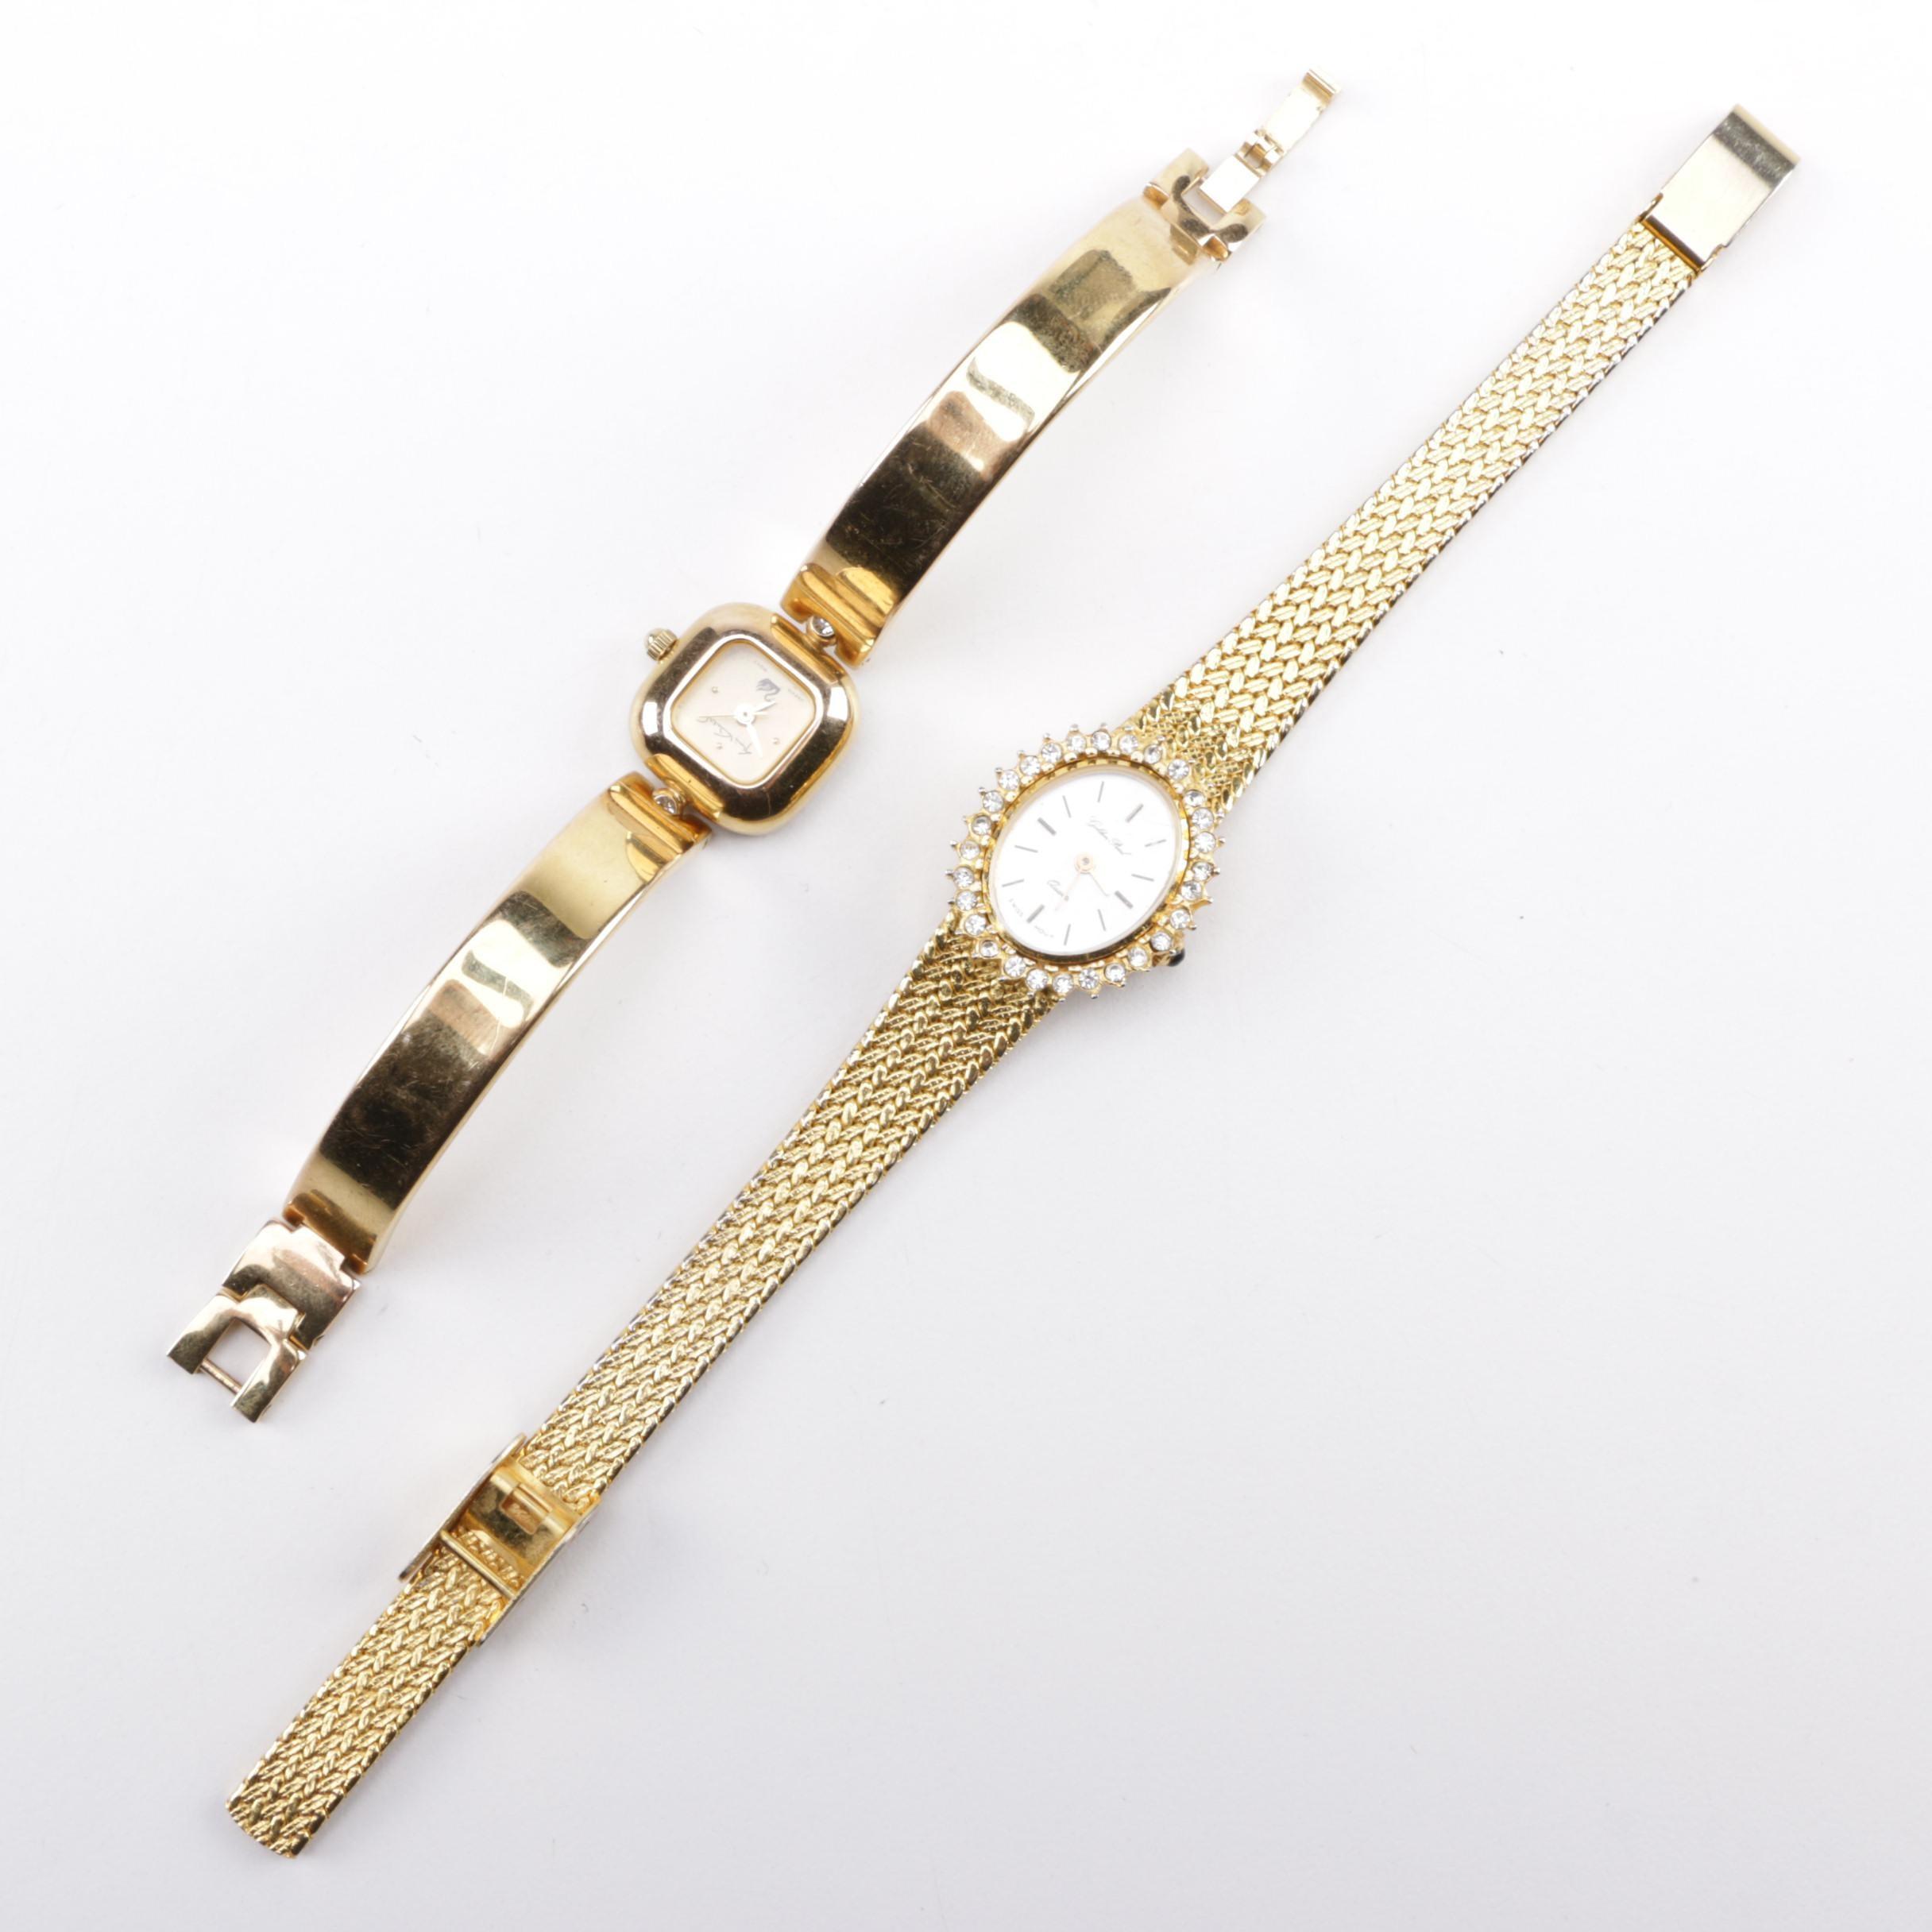 Gold Tone Wristwatches